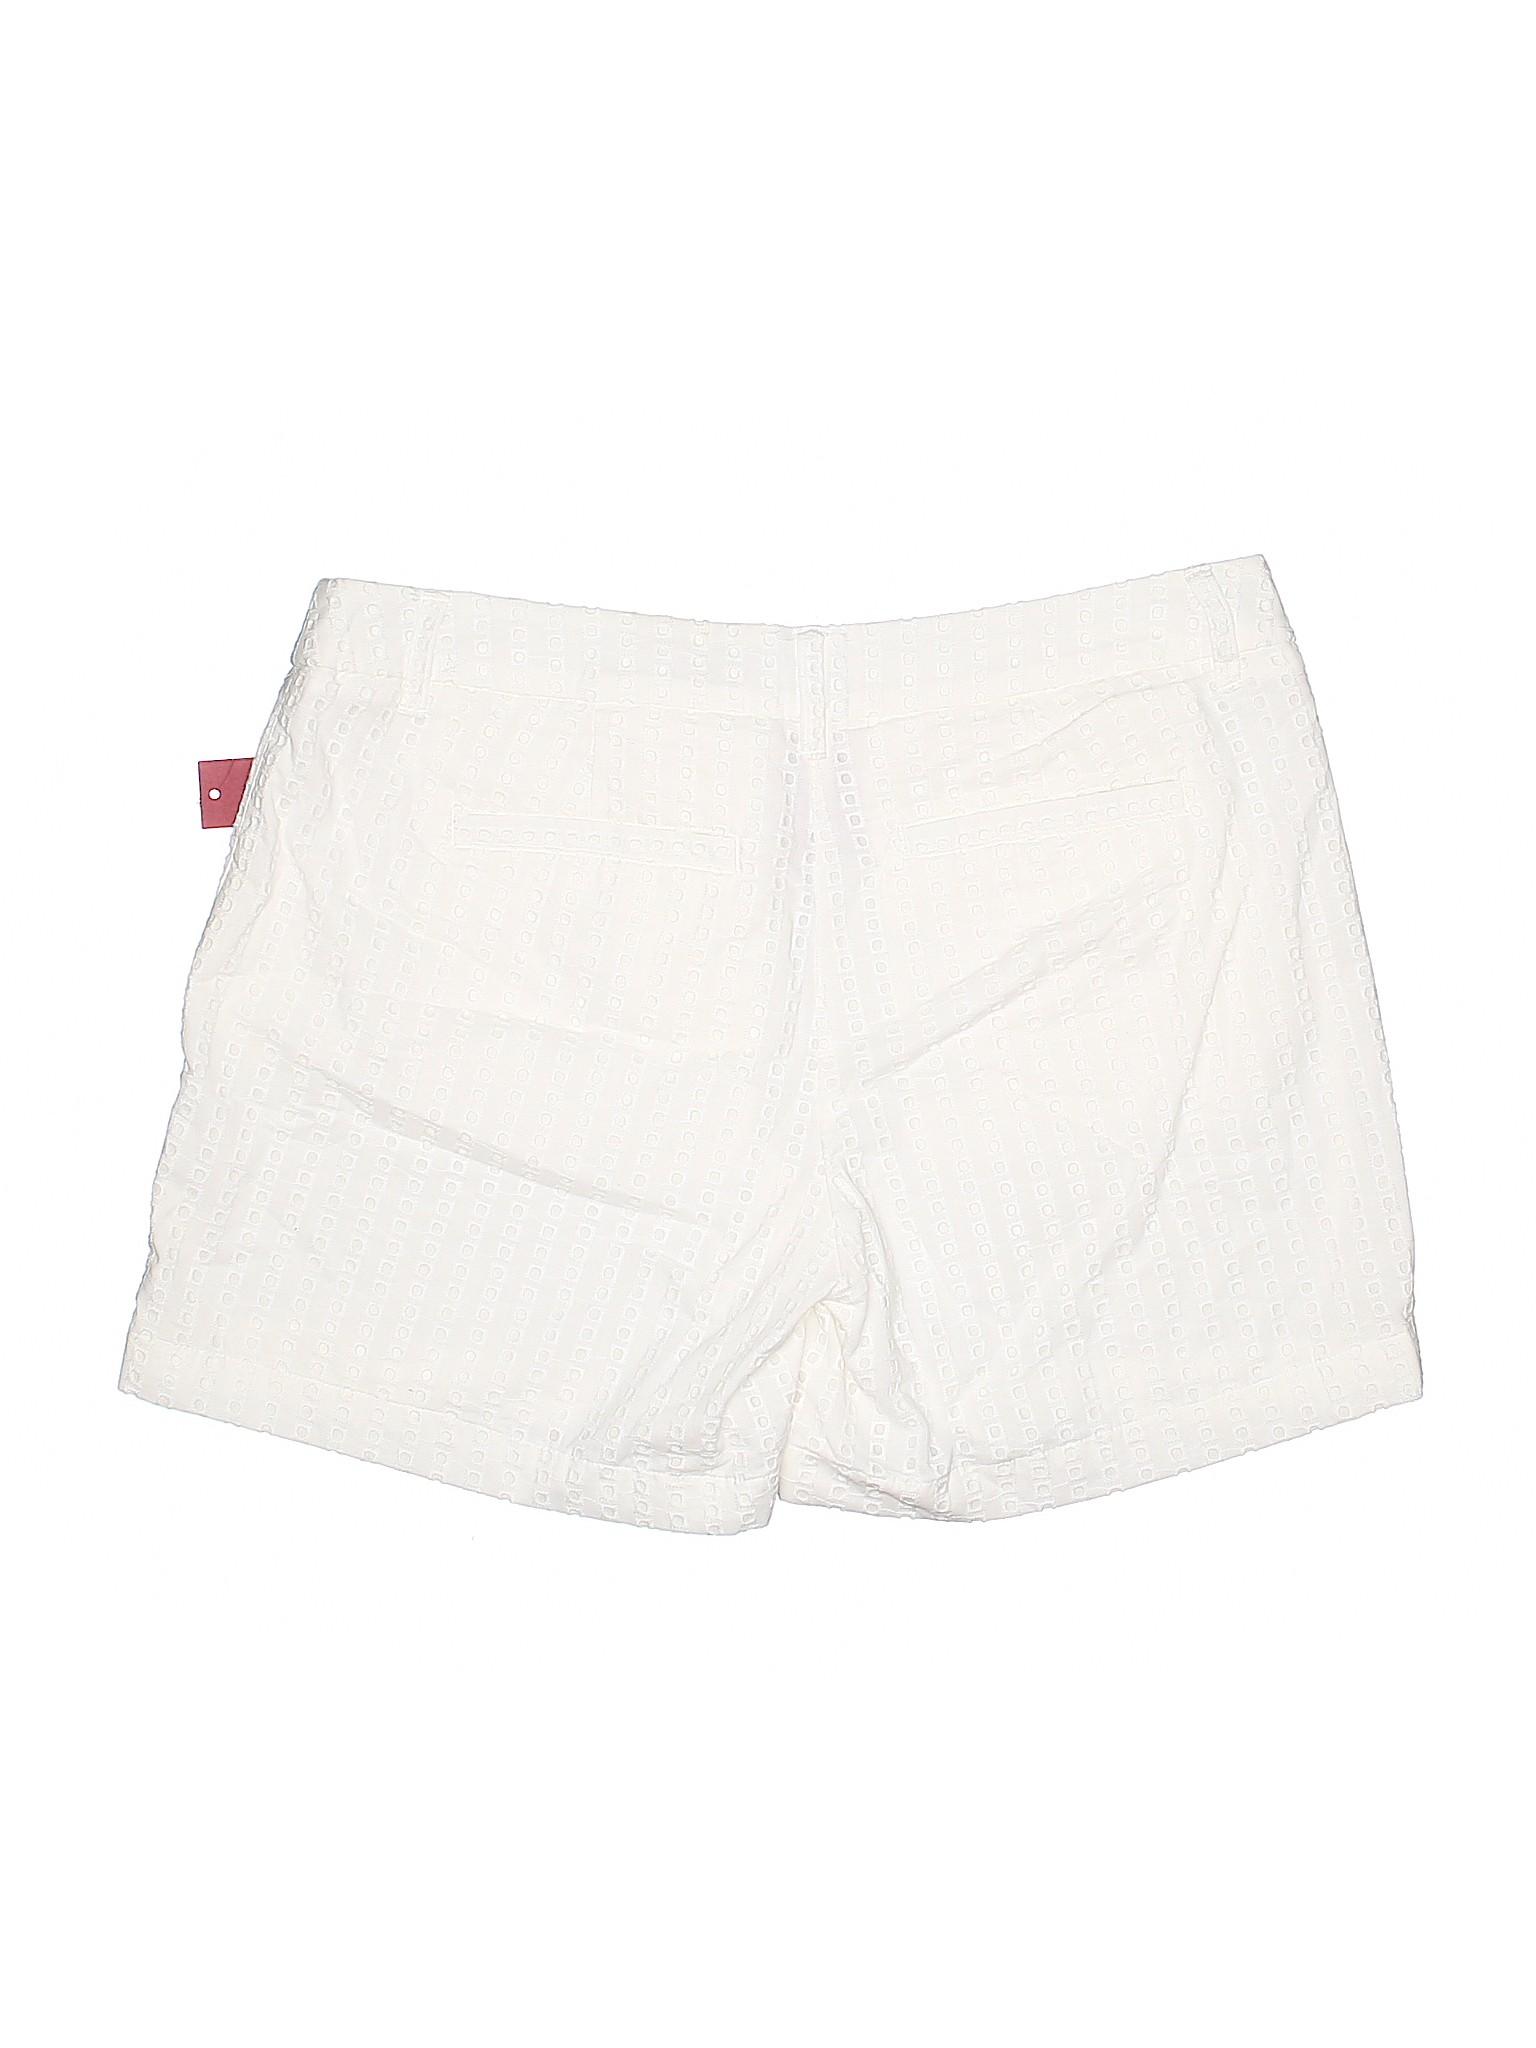 Shorts Merona Merona Boutique Boutique Shorts Shorts Boutique Merona Boutique f1fxqOzw